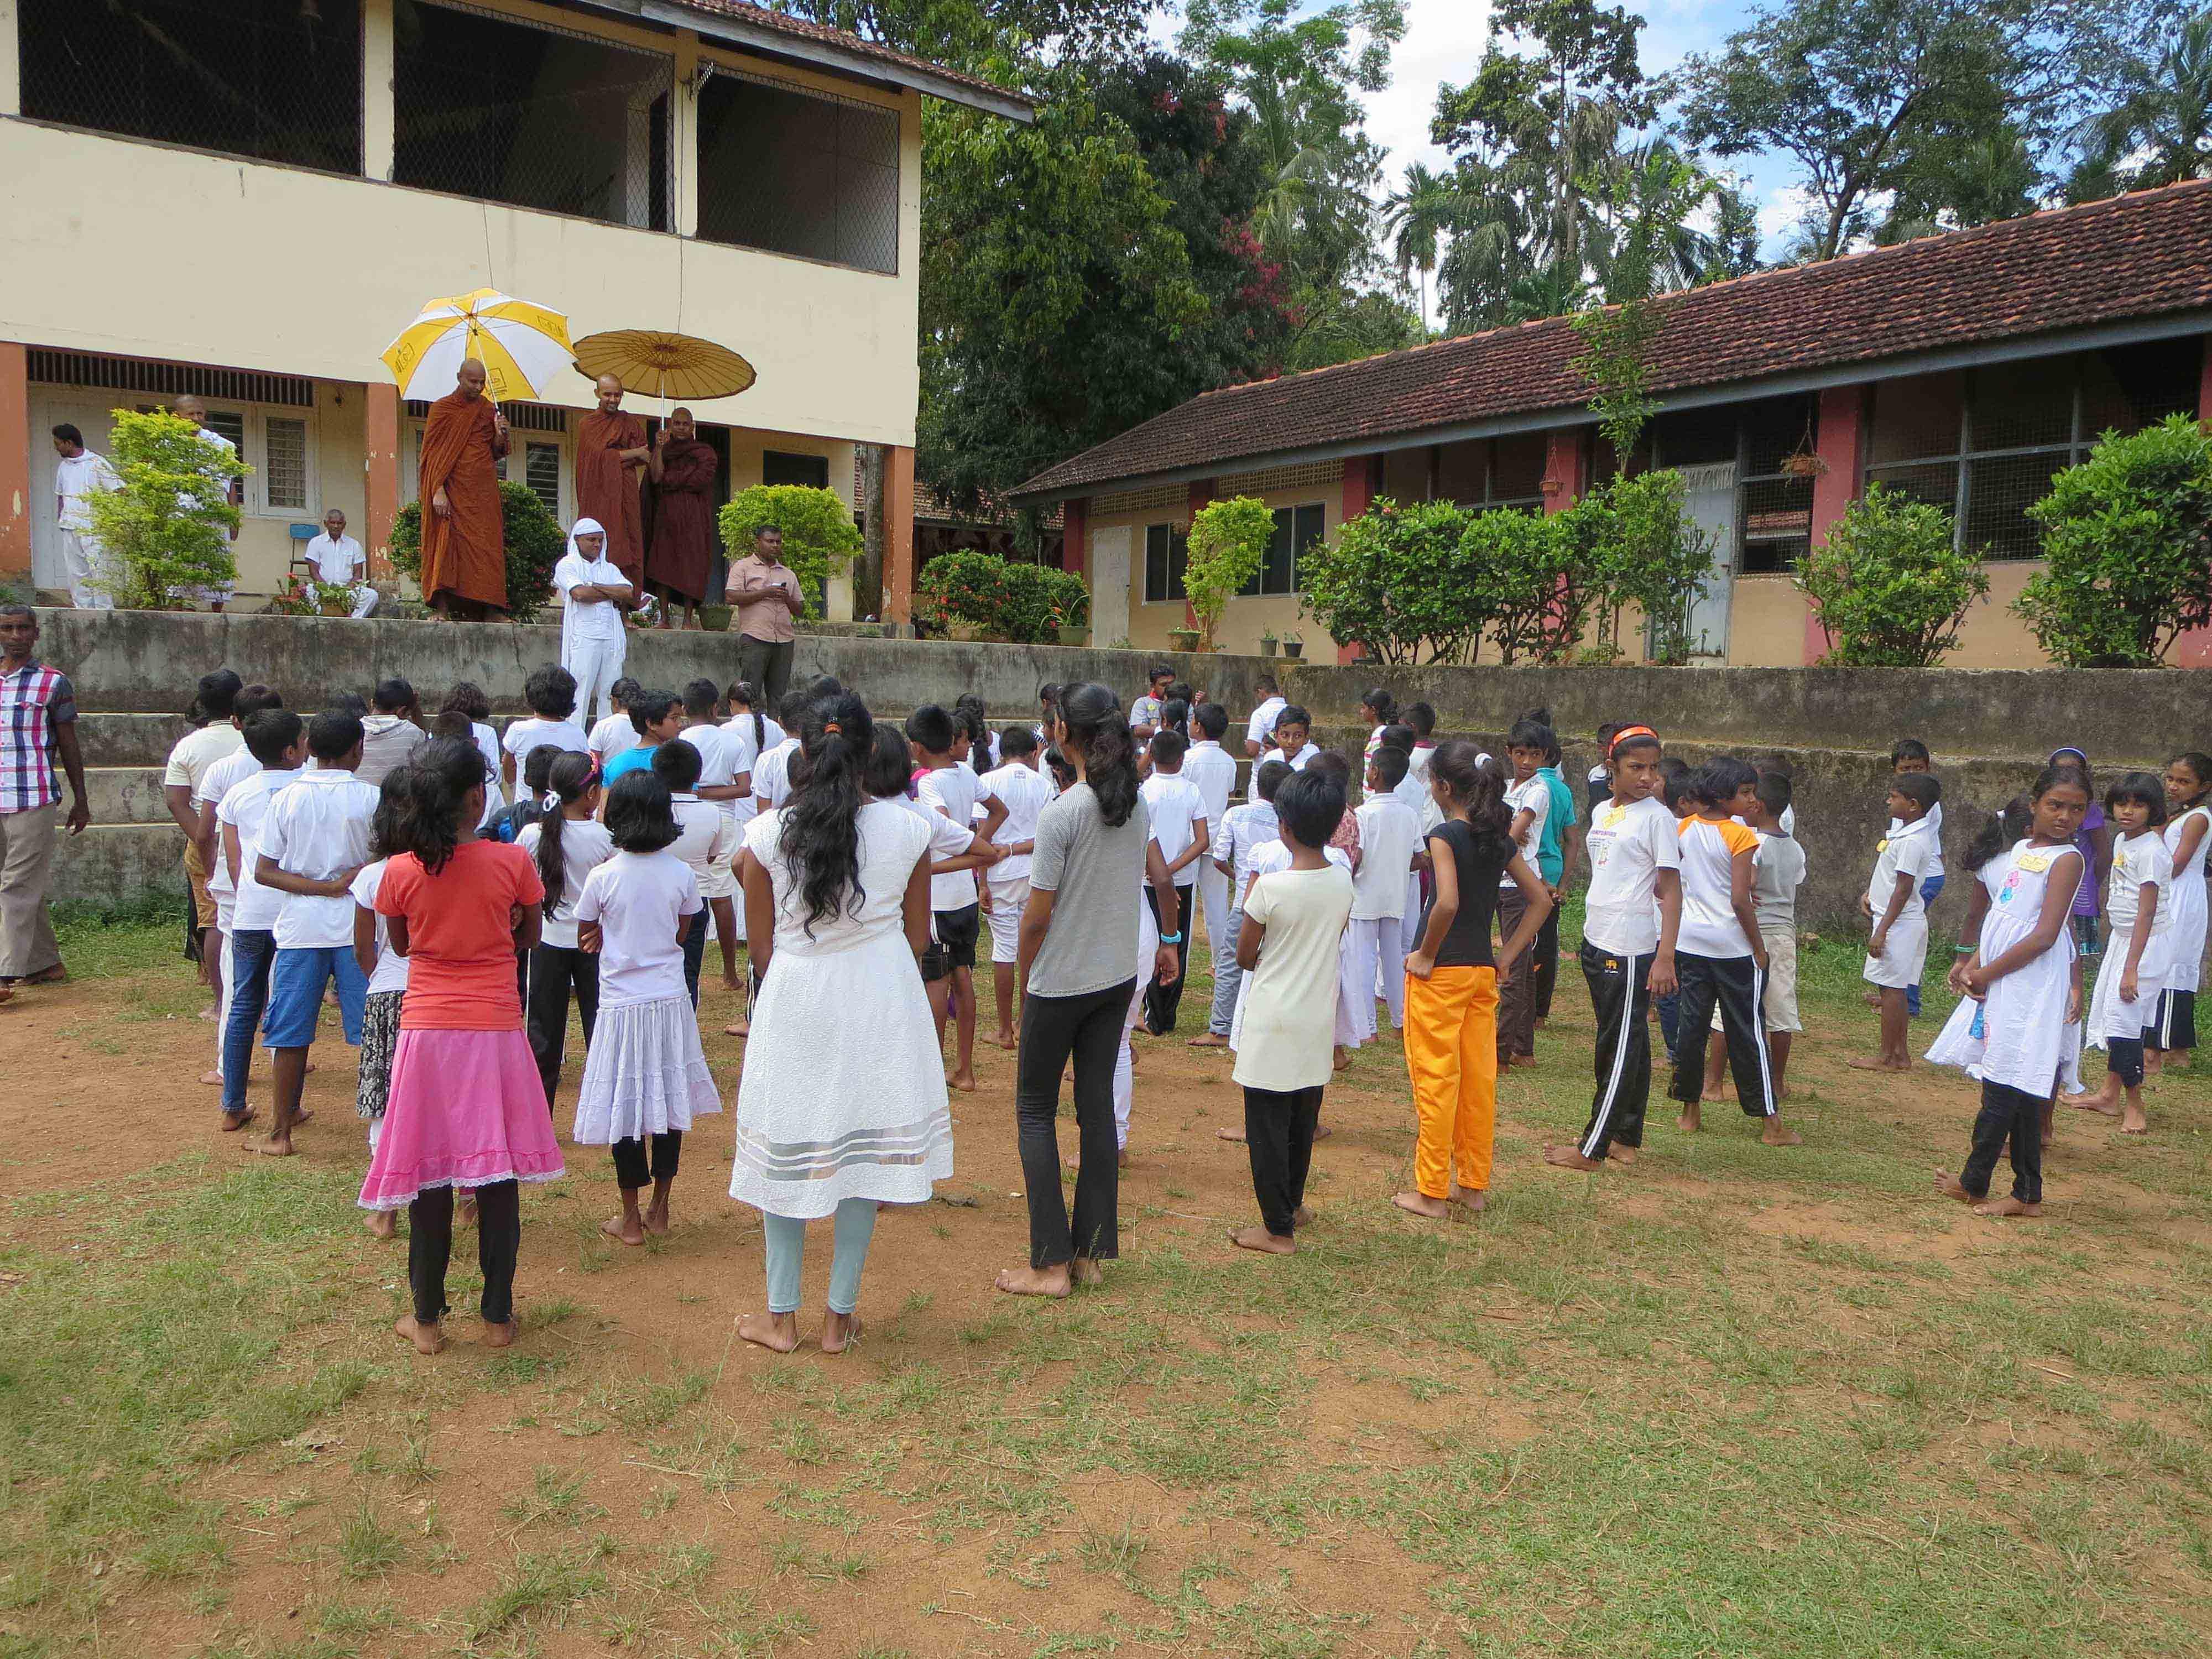 Sati Pasala Mindfulness Camp at Meethirigala Kanishta Vidyalaya-scouting activities (1)